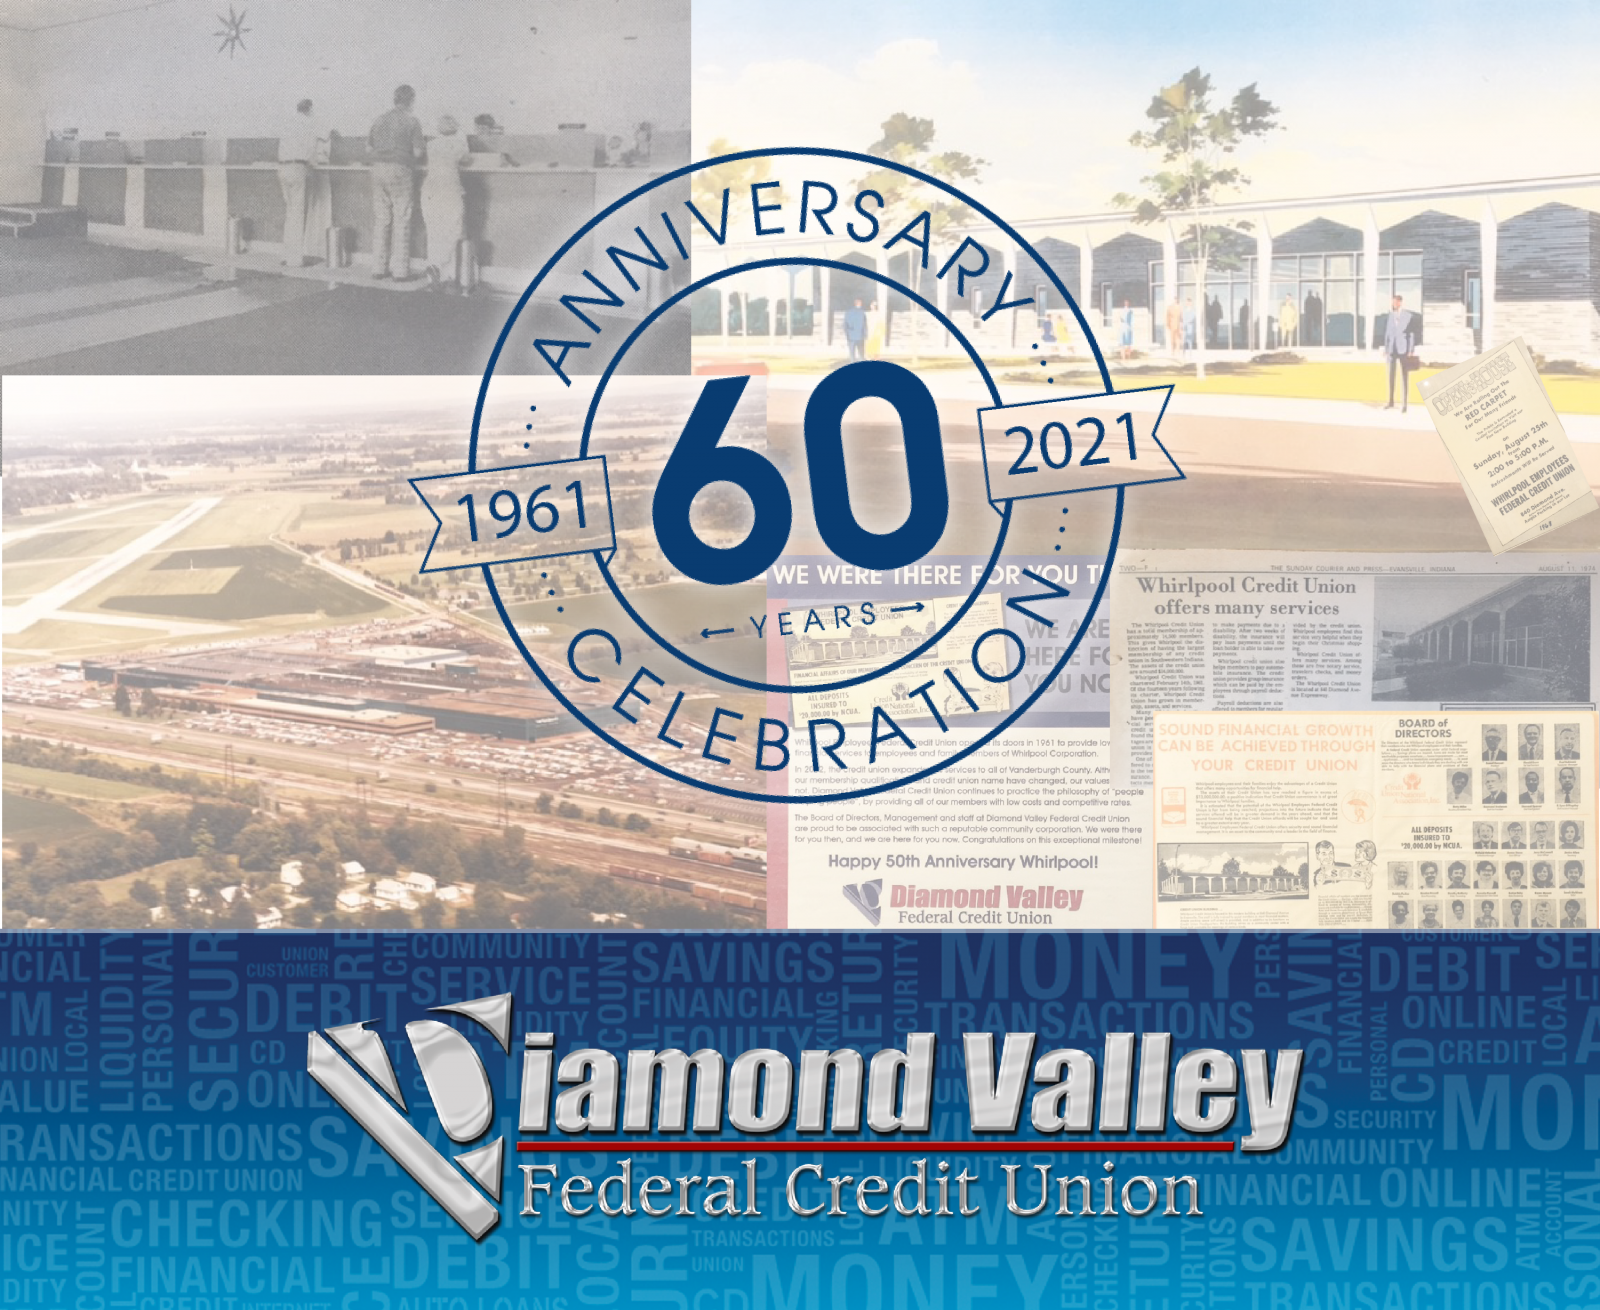 Diamond Valley Federal Credit Union Celebrates 60 Years!